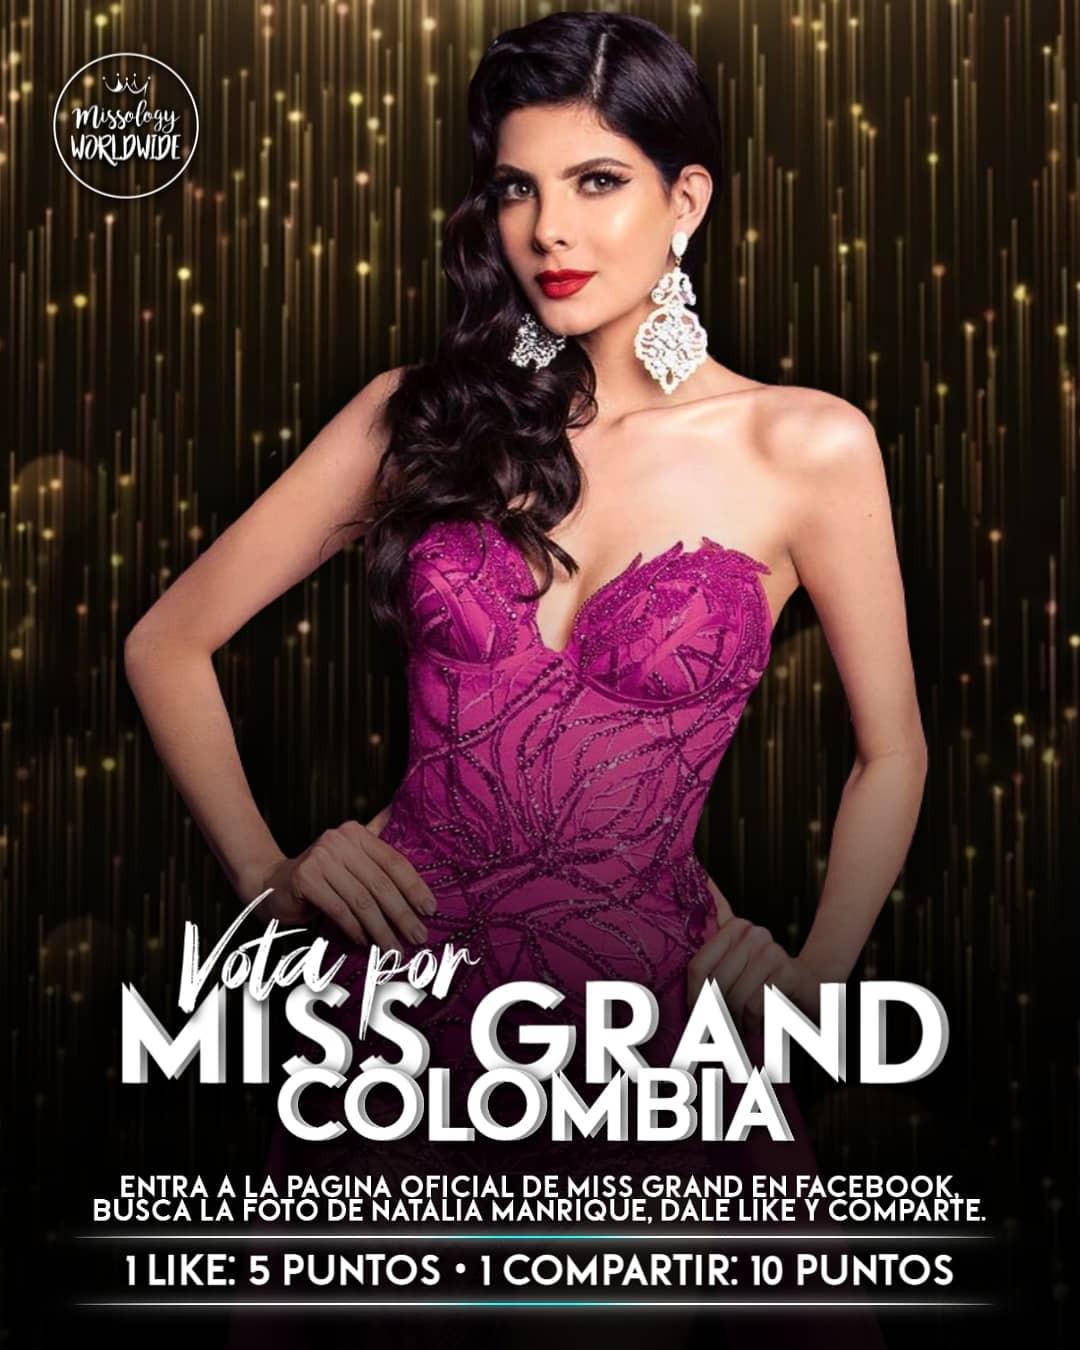 natalia manrique, miss grand colombia 2020. - Página 3 Fd0nd710